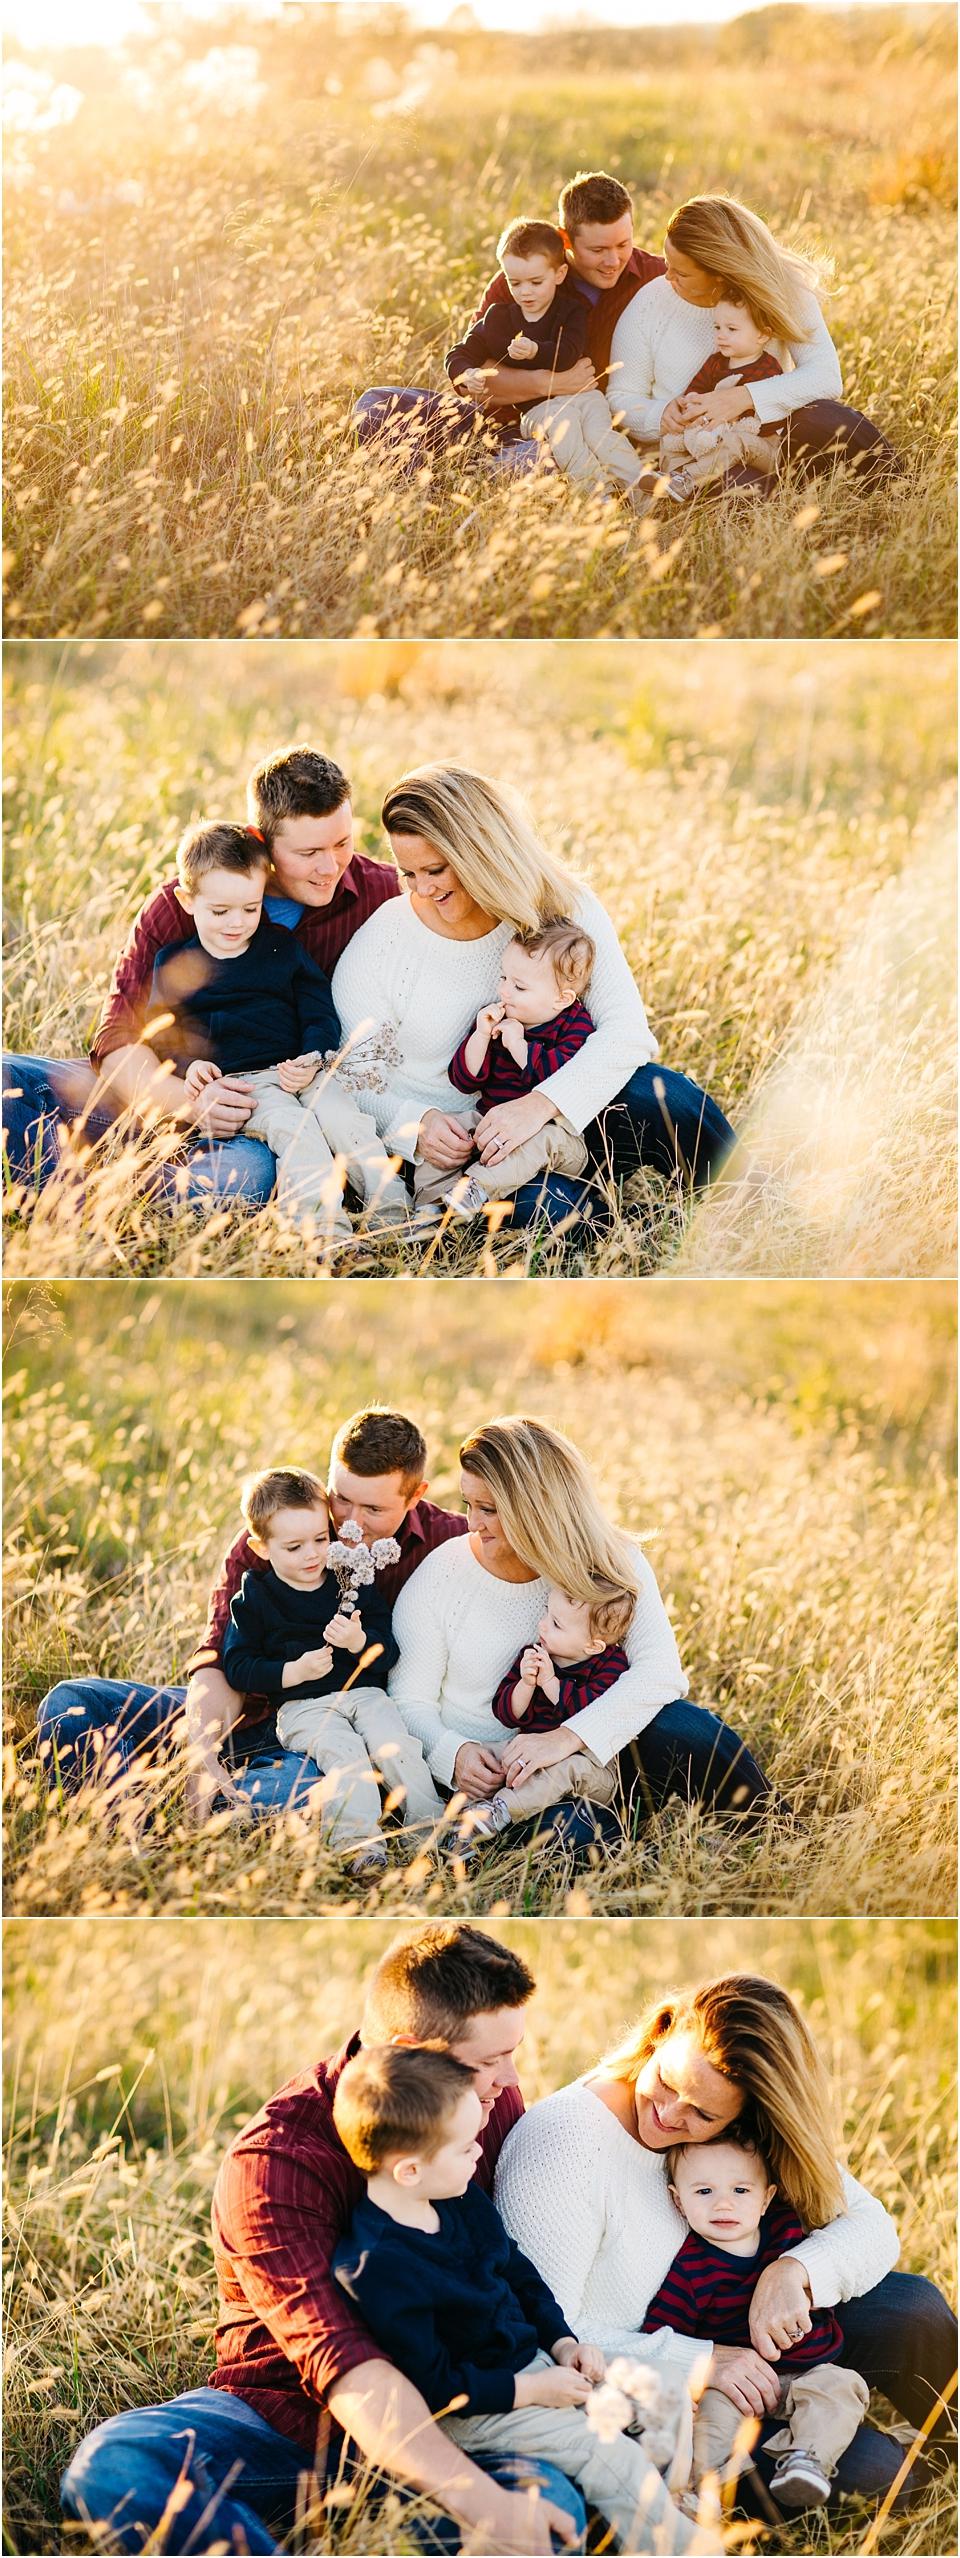 kansascityfamilyphotographer_0011